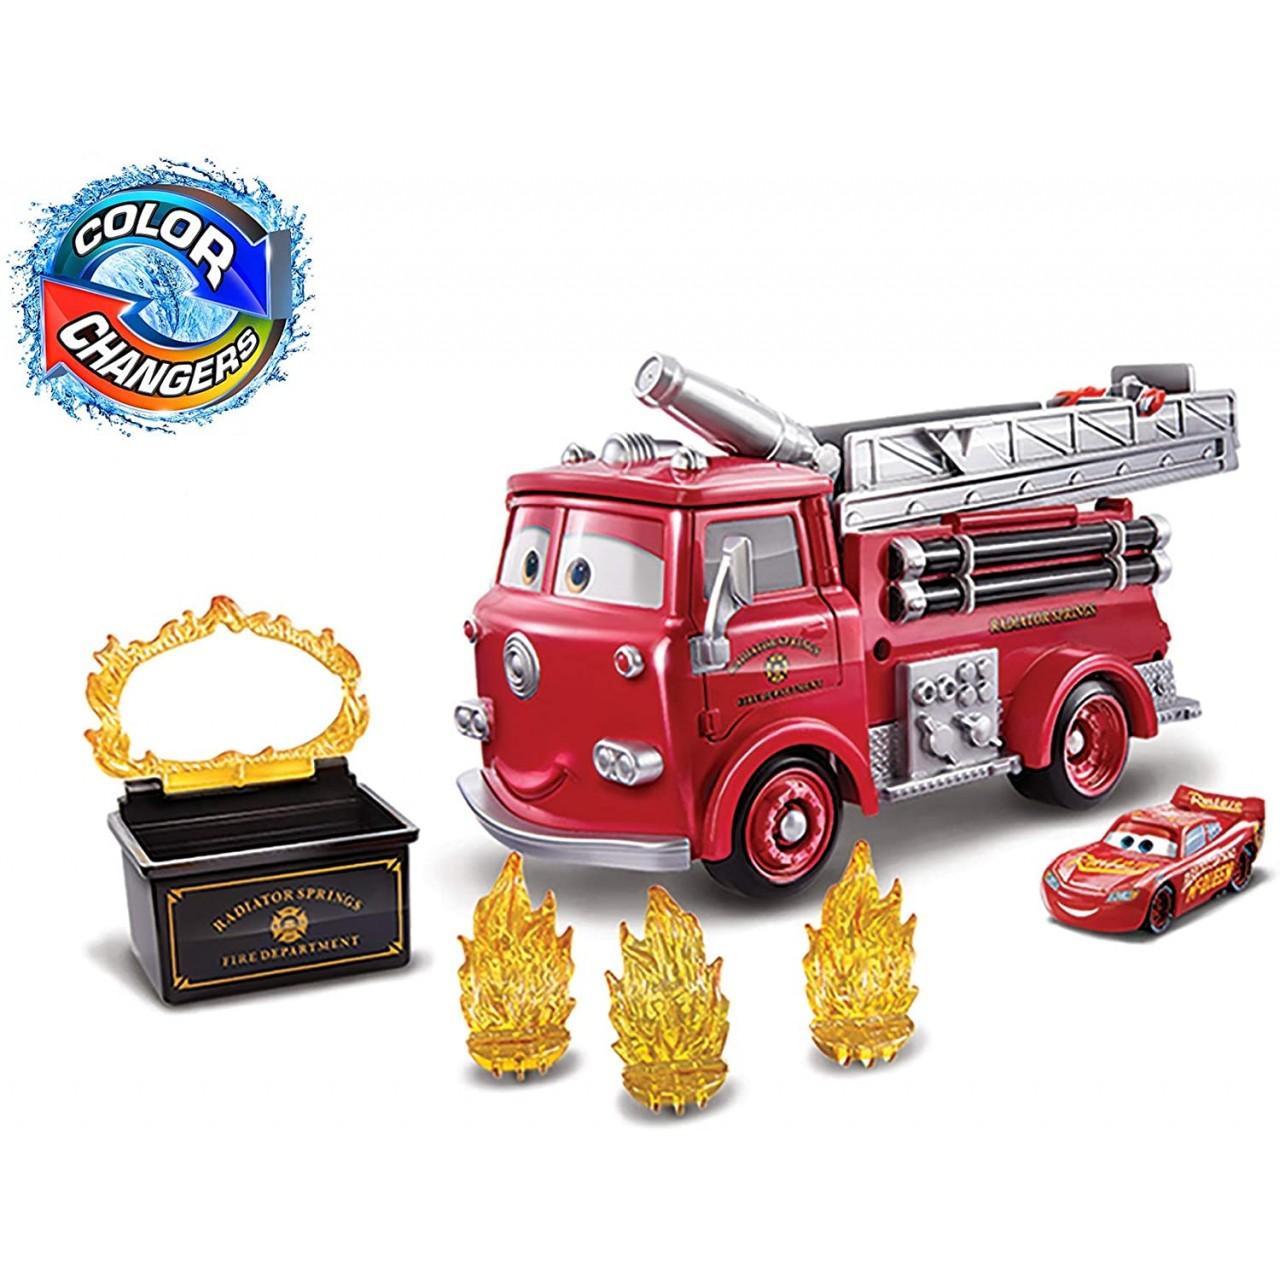 "Набір Тачки 3: Блискавка Маккуїн і Пожежна машина Ред ""Вогняна пастка: міняй колір"" GPH80 Mattel"